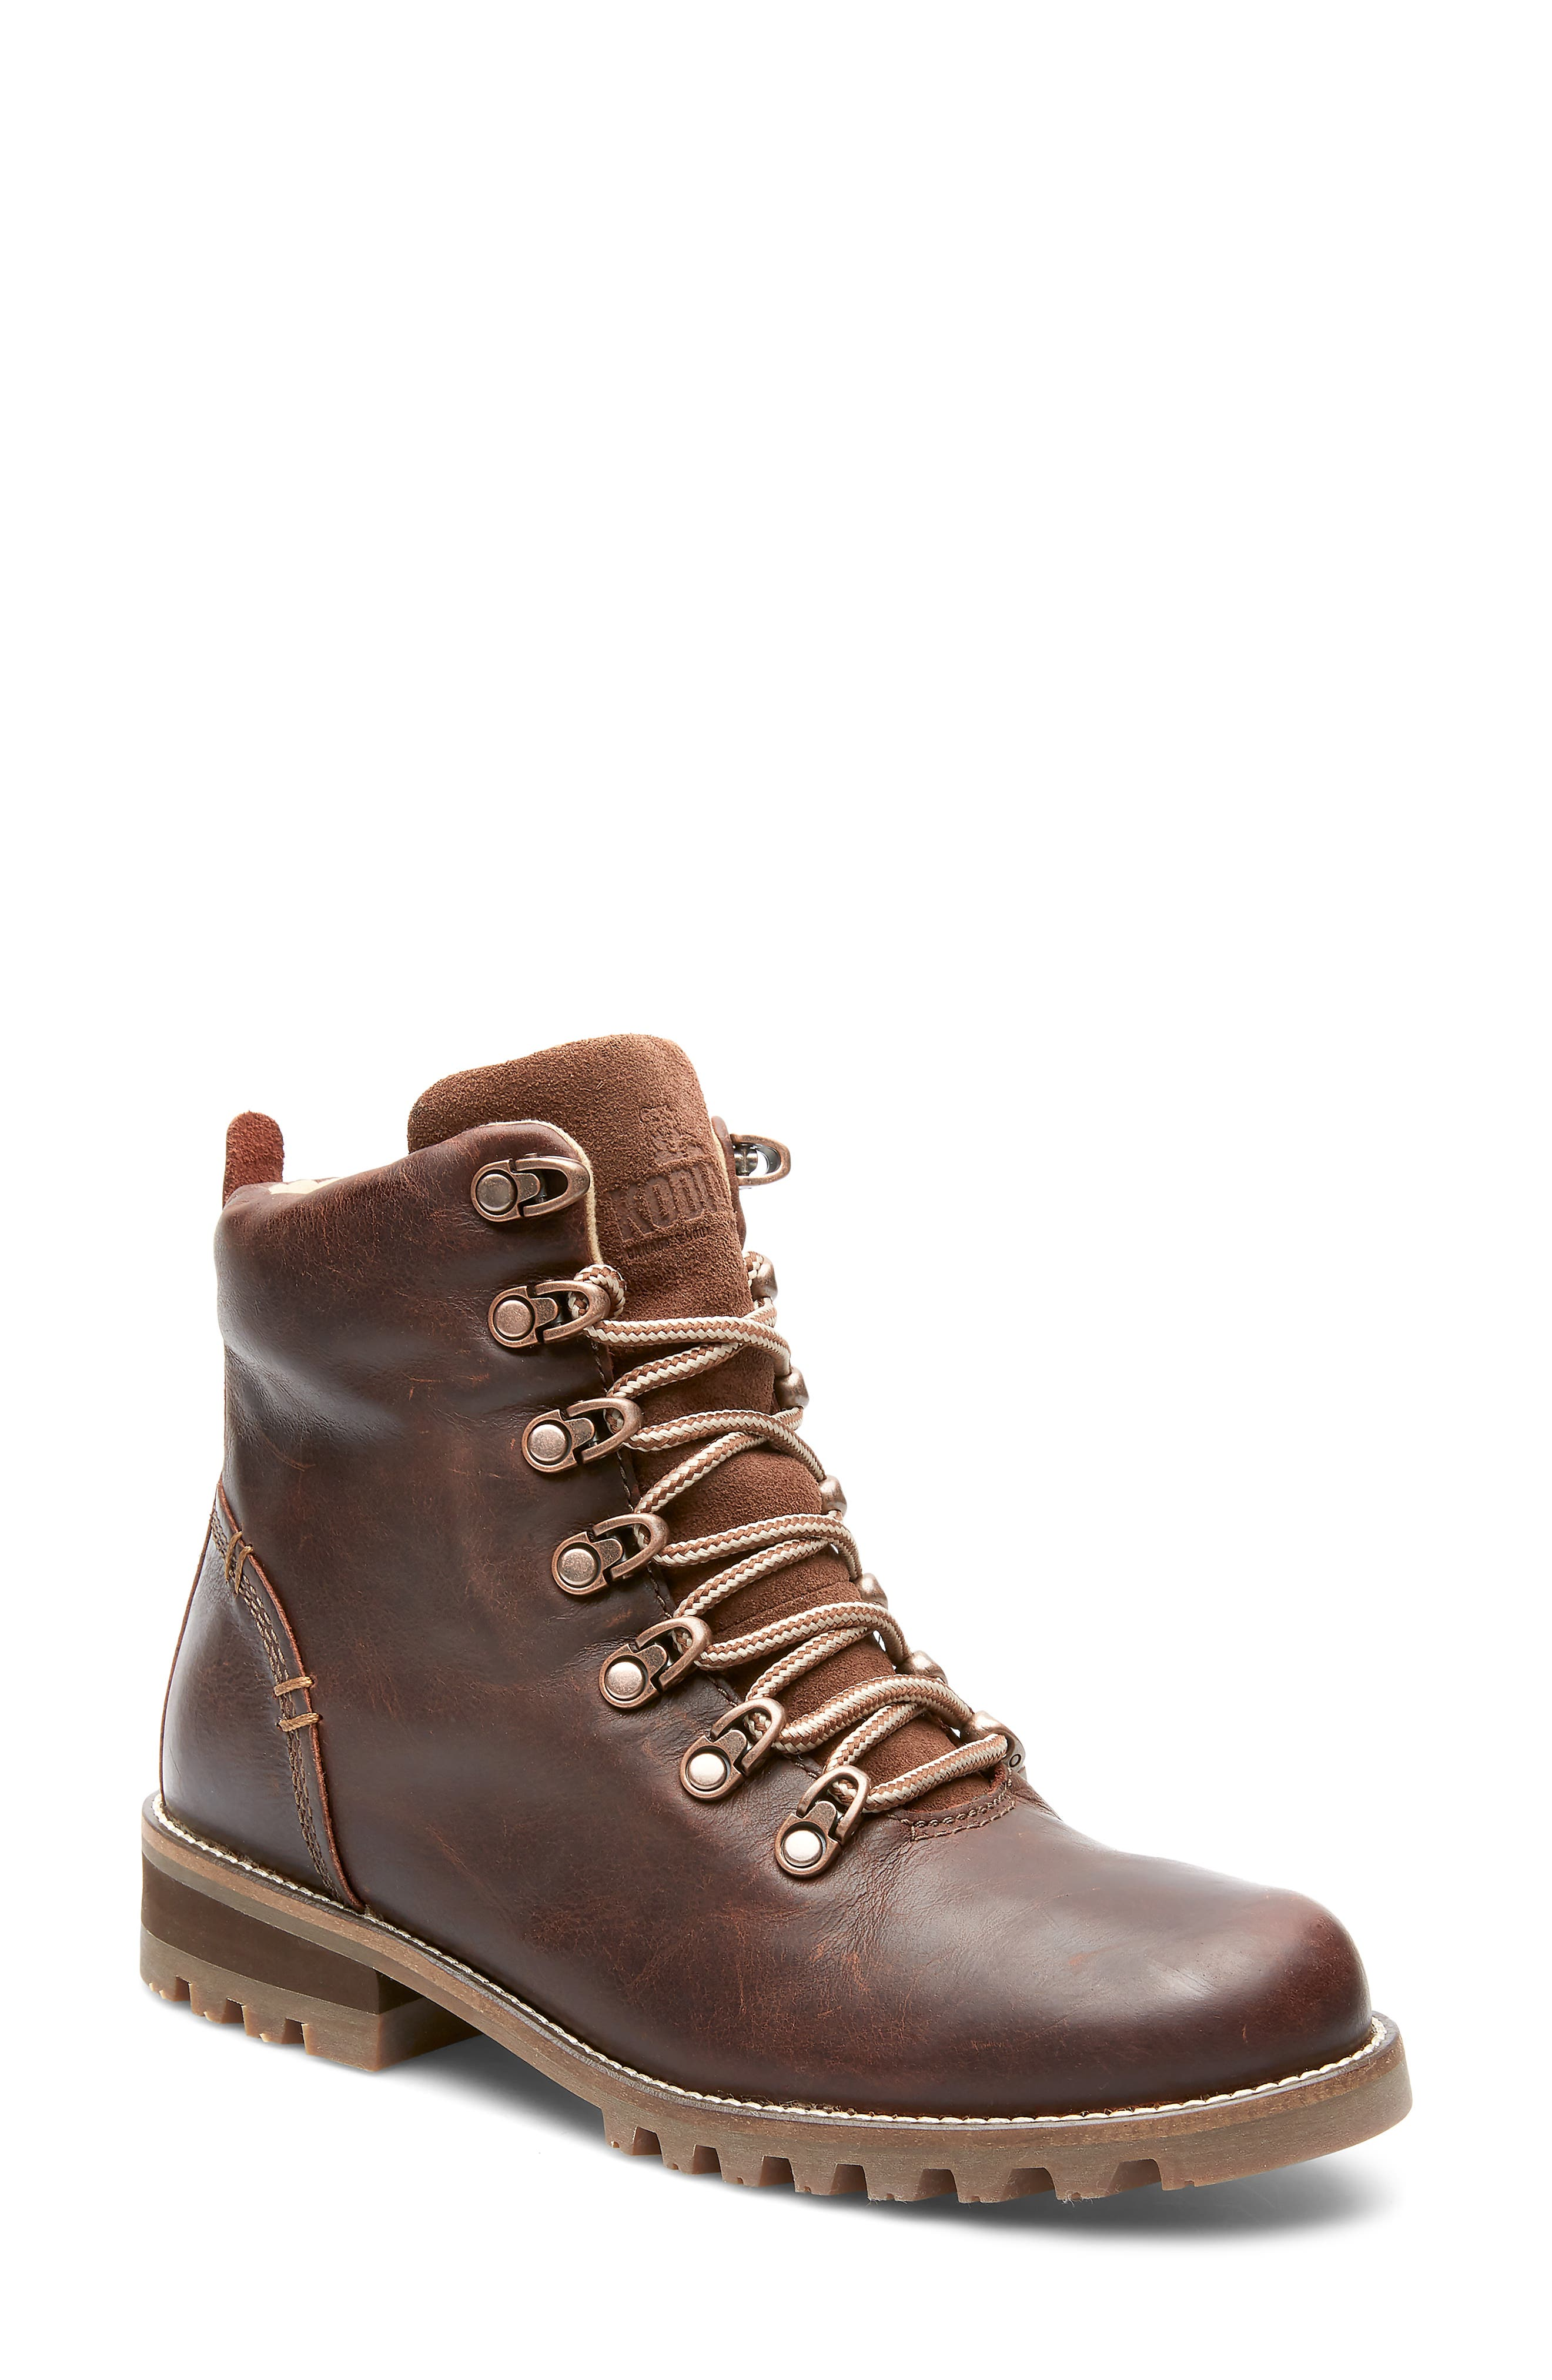 Fernie Waterproof Hiker Boot